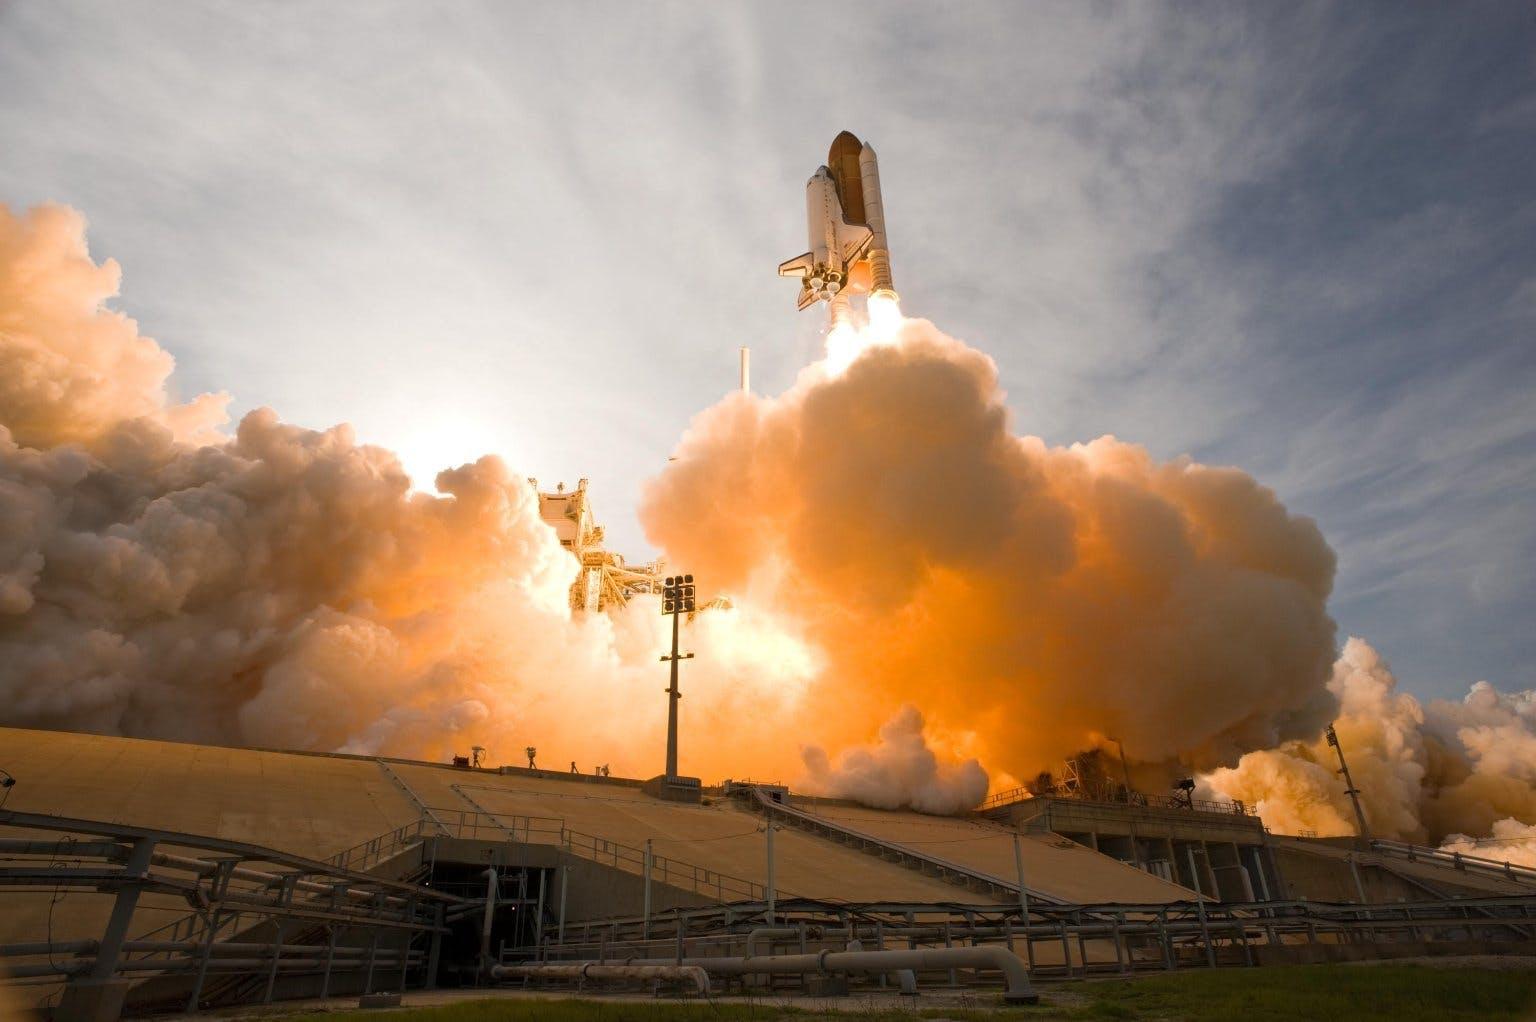 launching of white space shuttle  u00b7 free stock photo